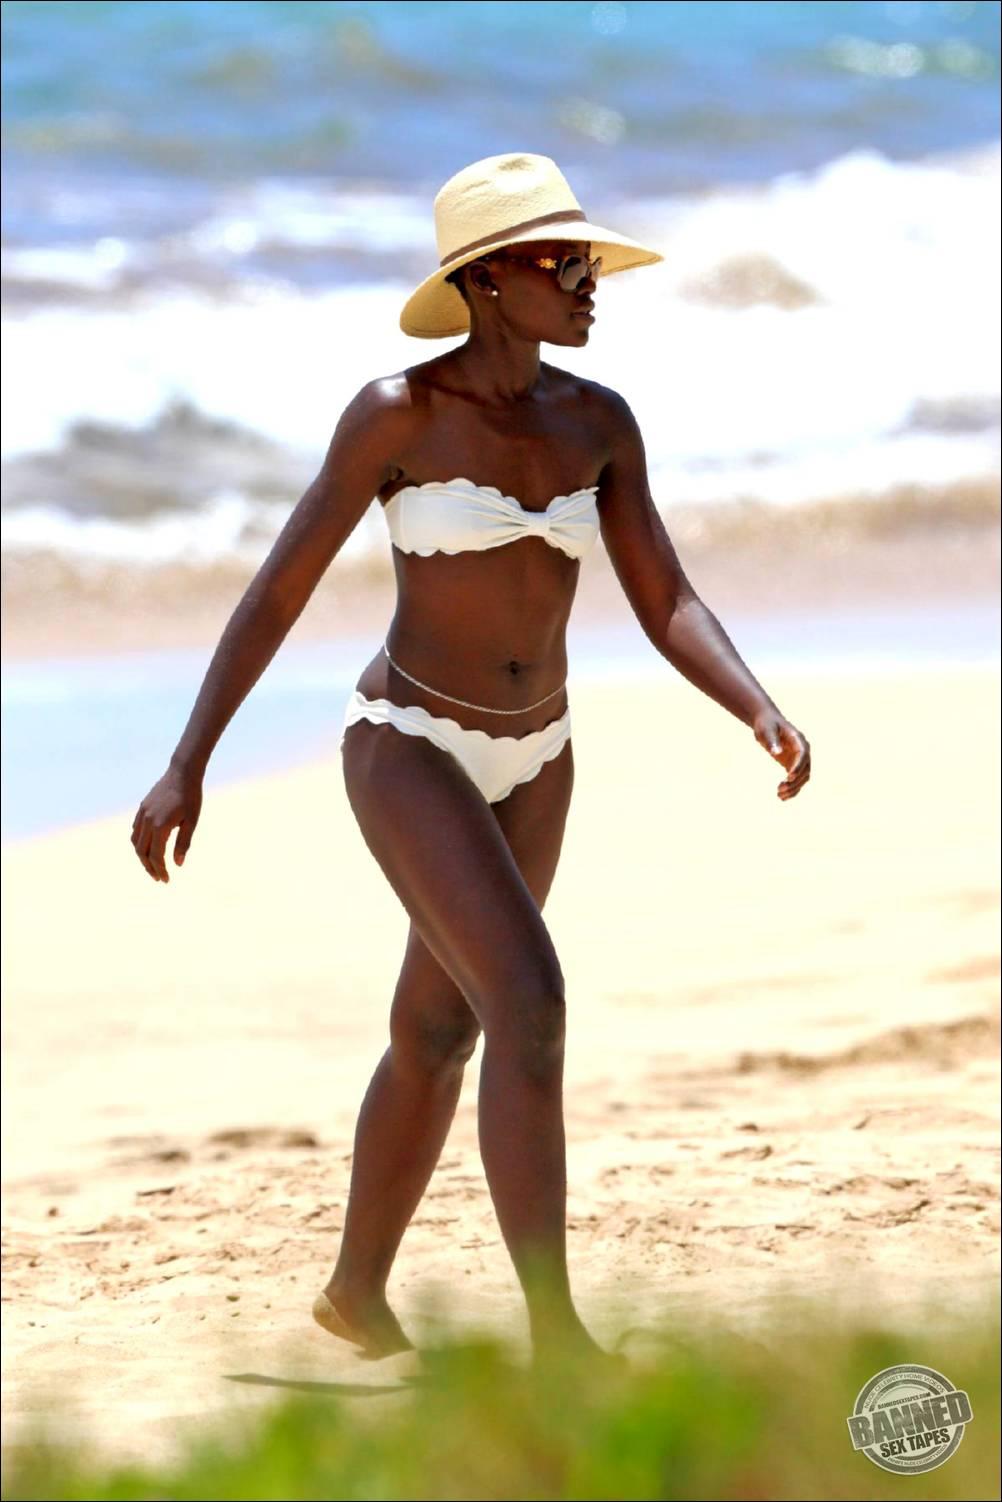 lupita nyongo nude photos and videos at banned sex tapes